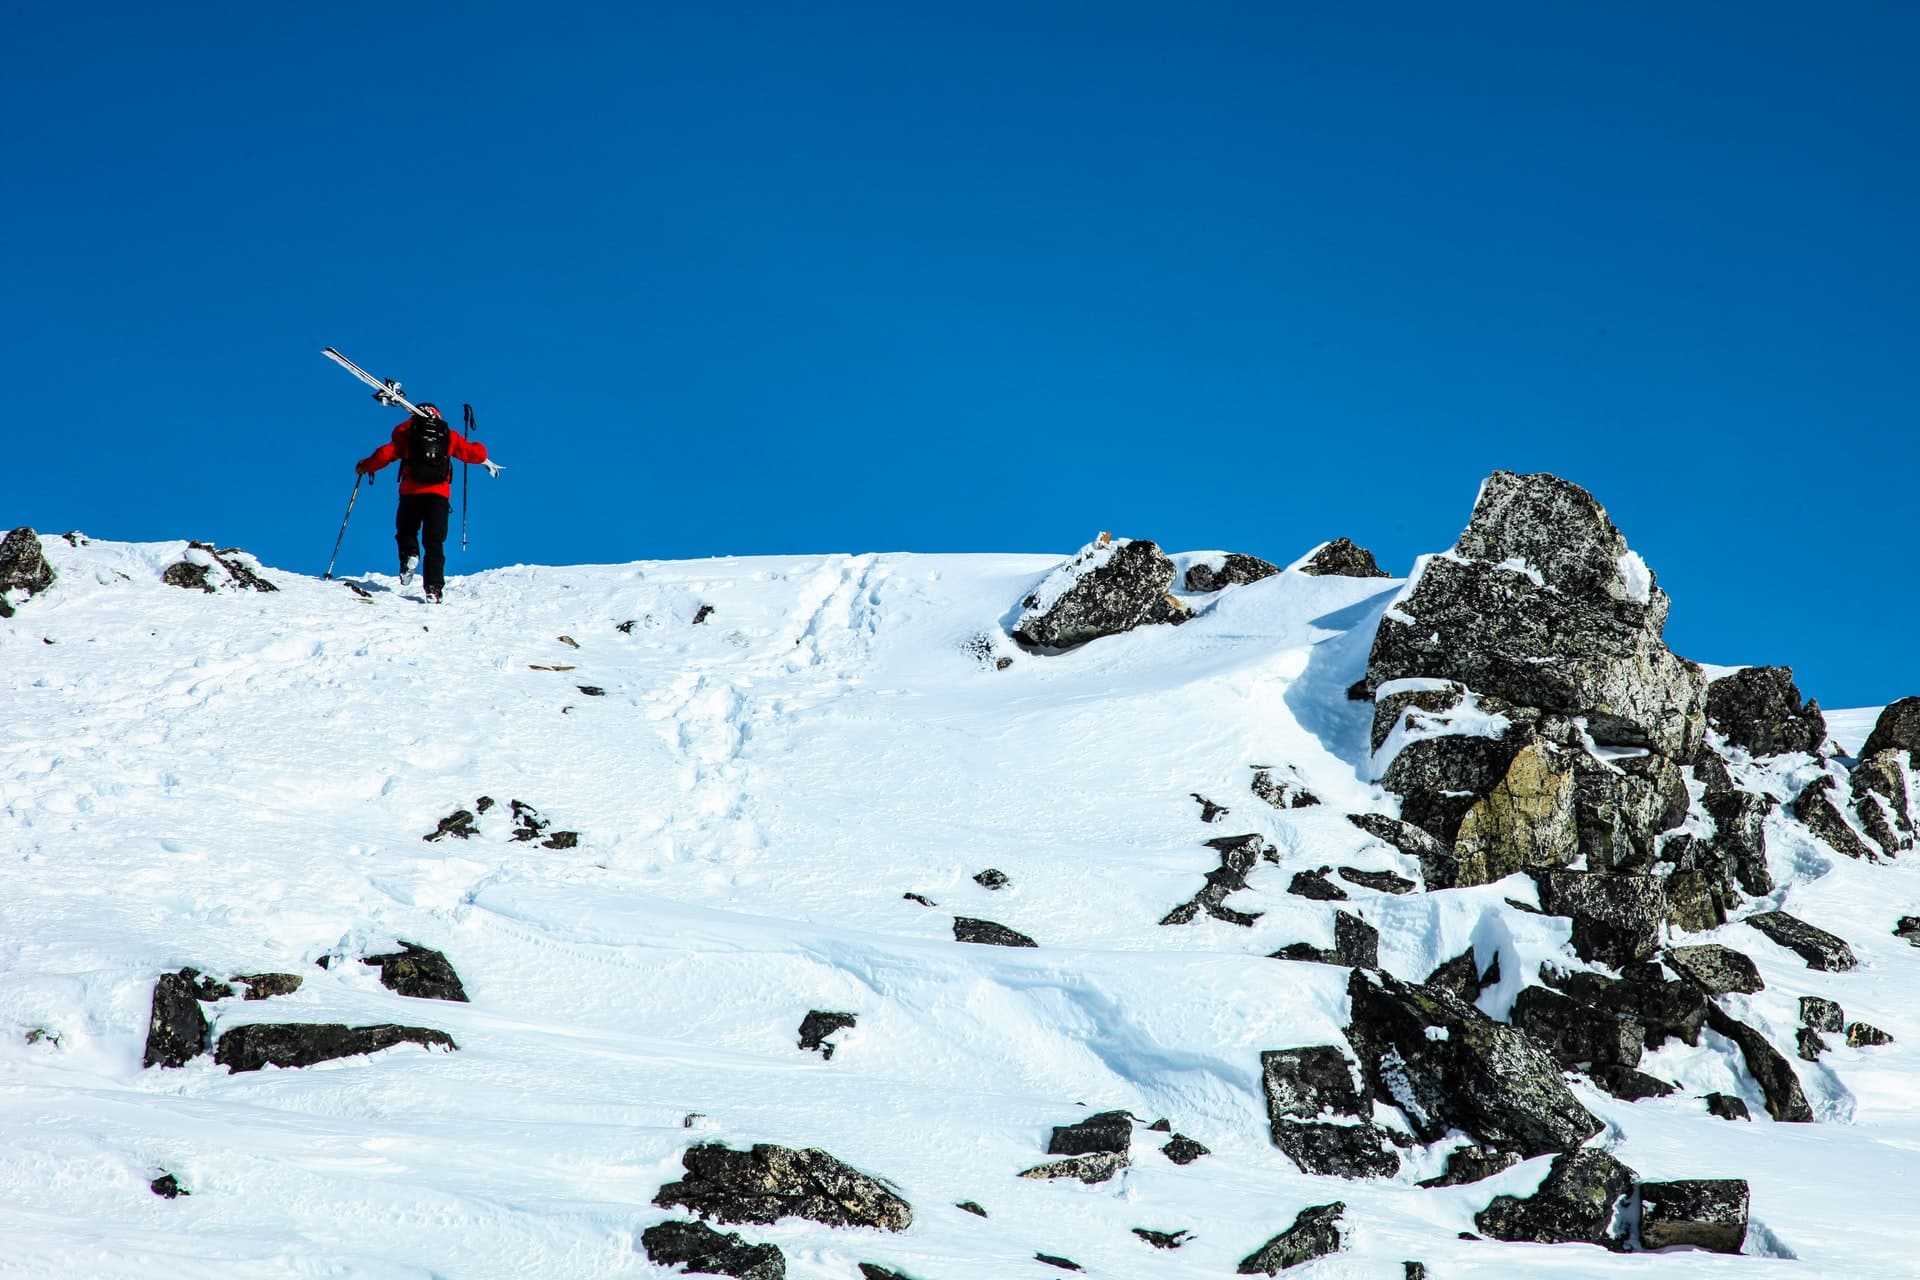 carrying ski